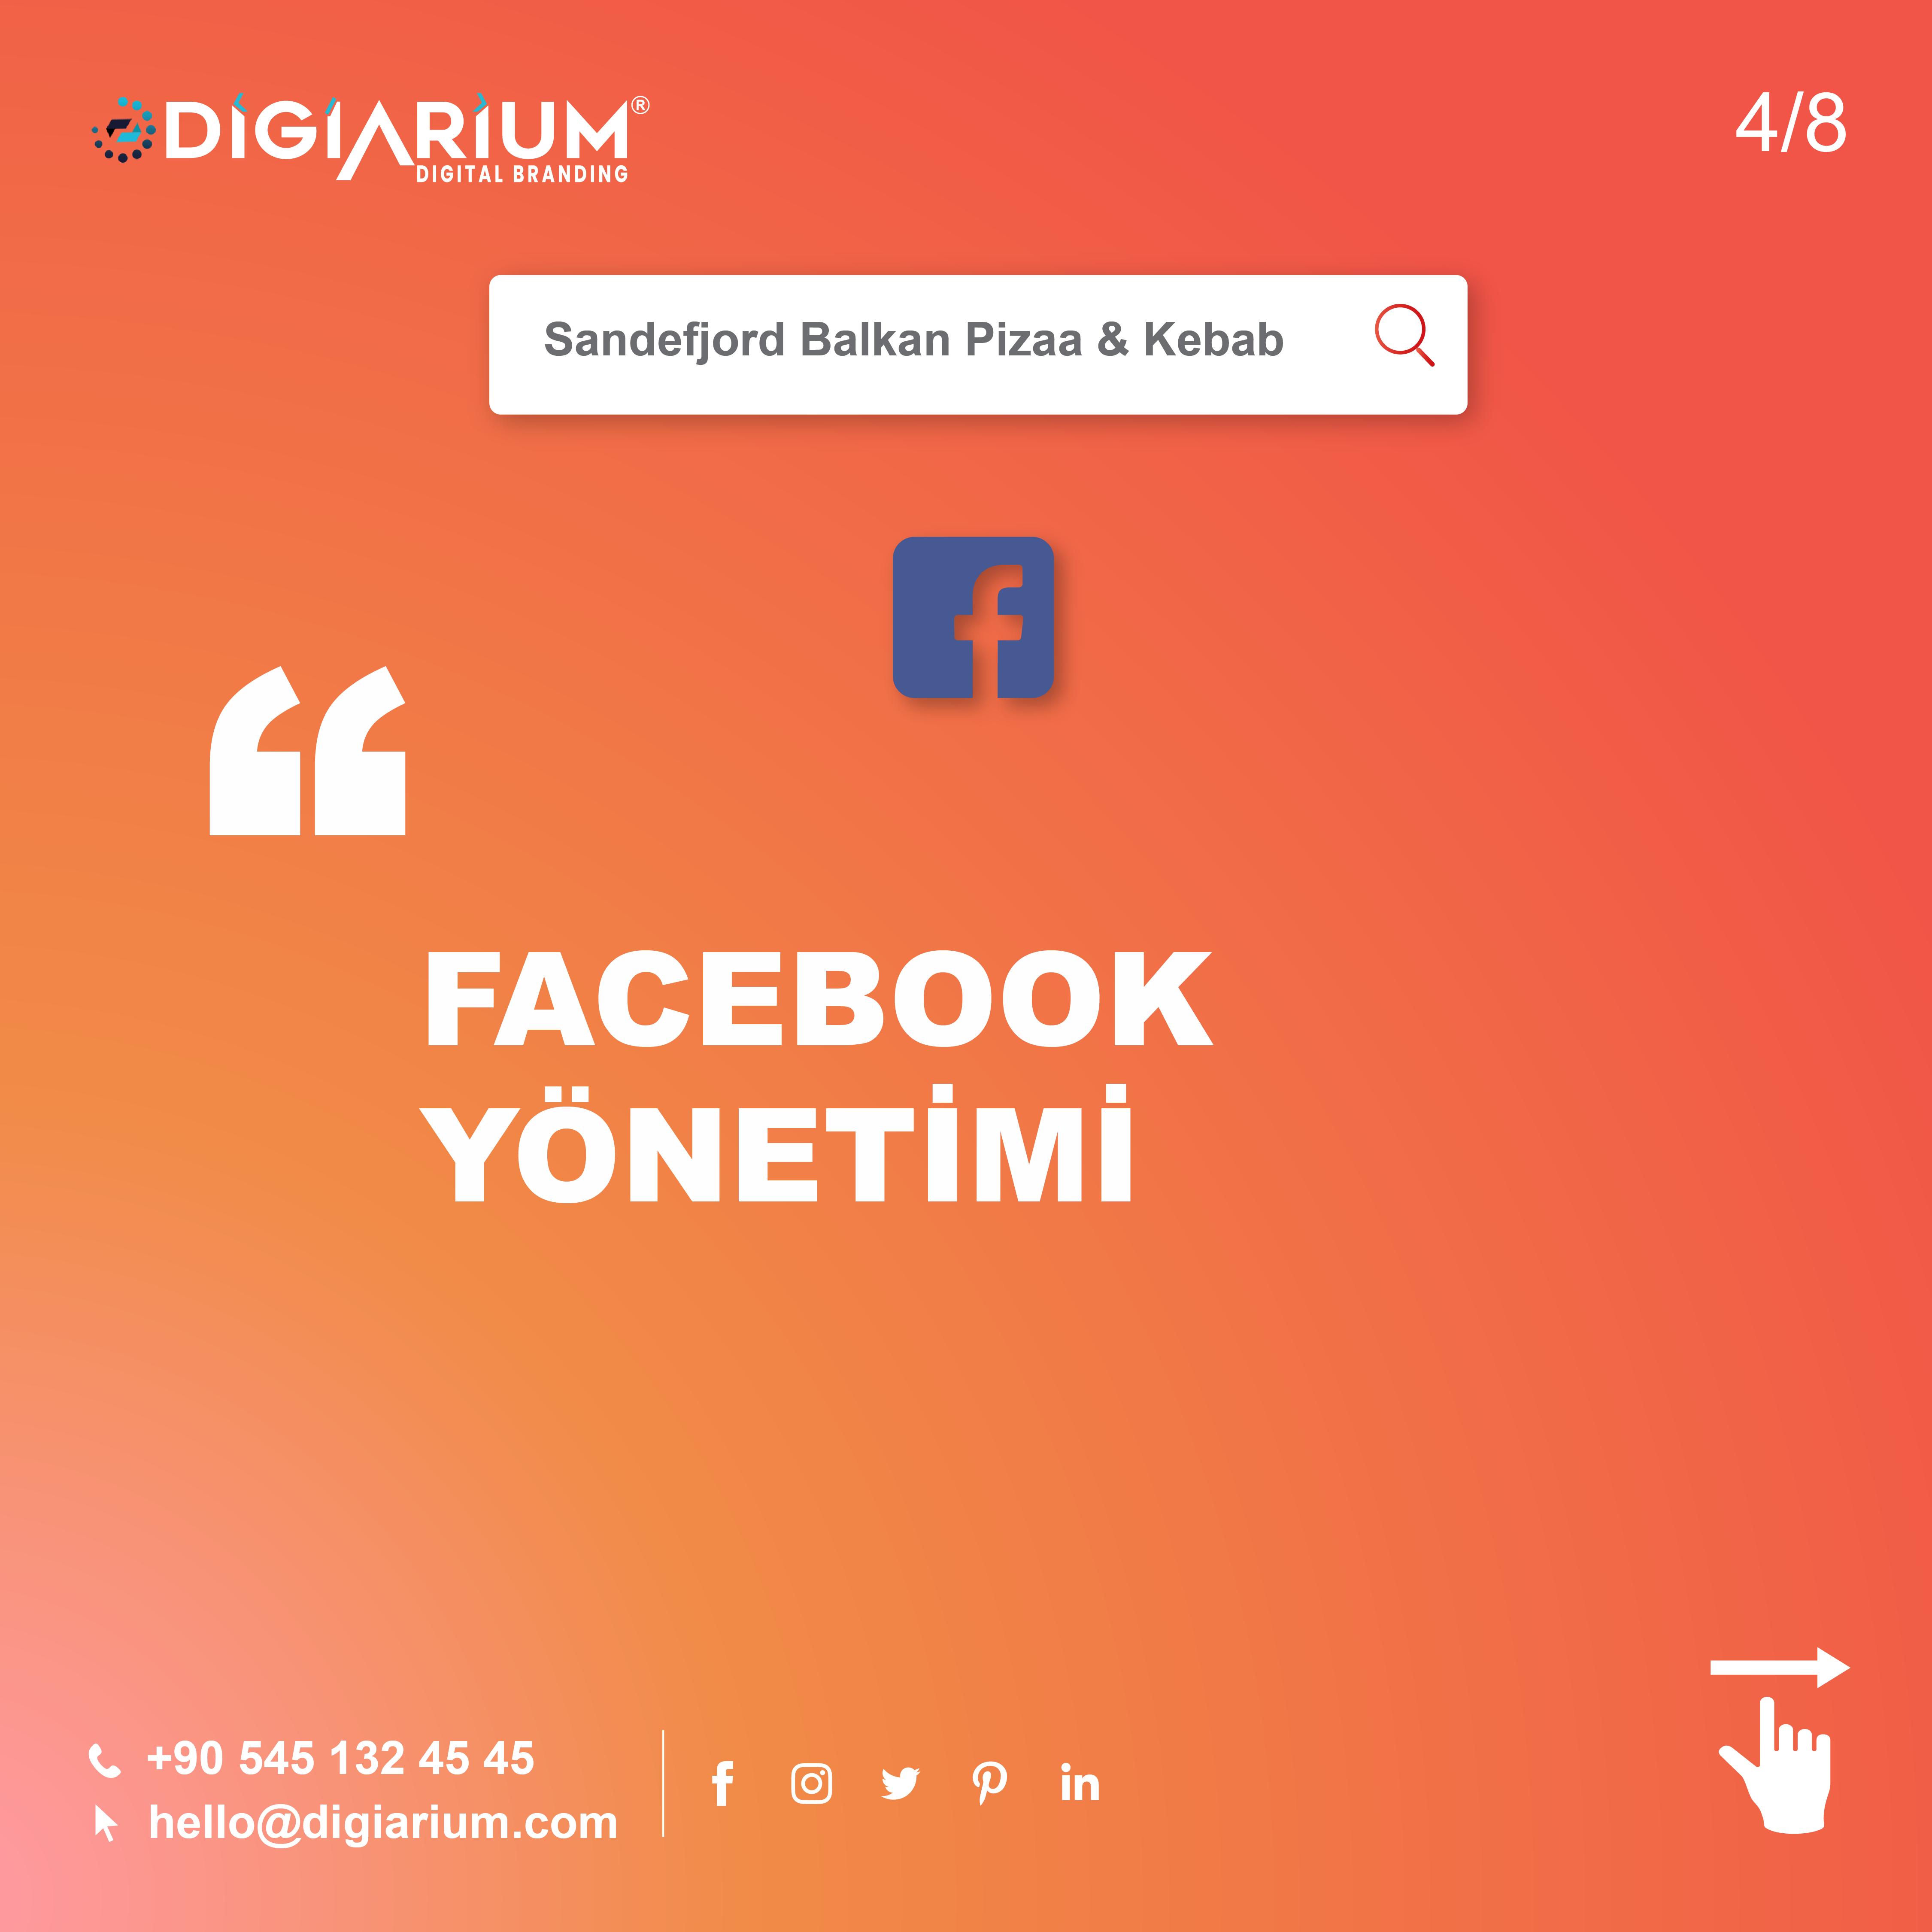 facebook reklam yönetimi , instagram reklam yönetimi , instagram reklam kurulumu , facebook reklam kurulumu